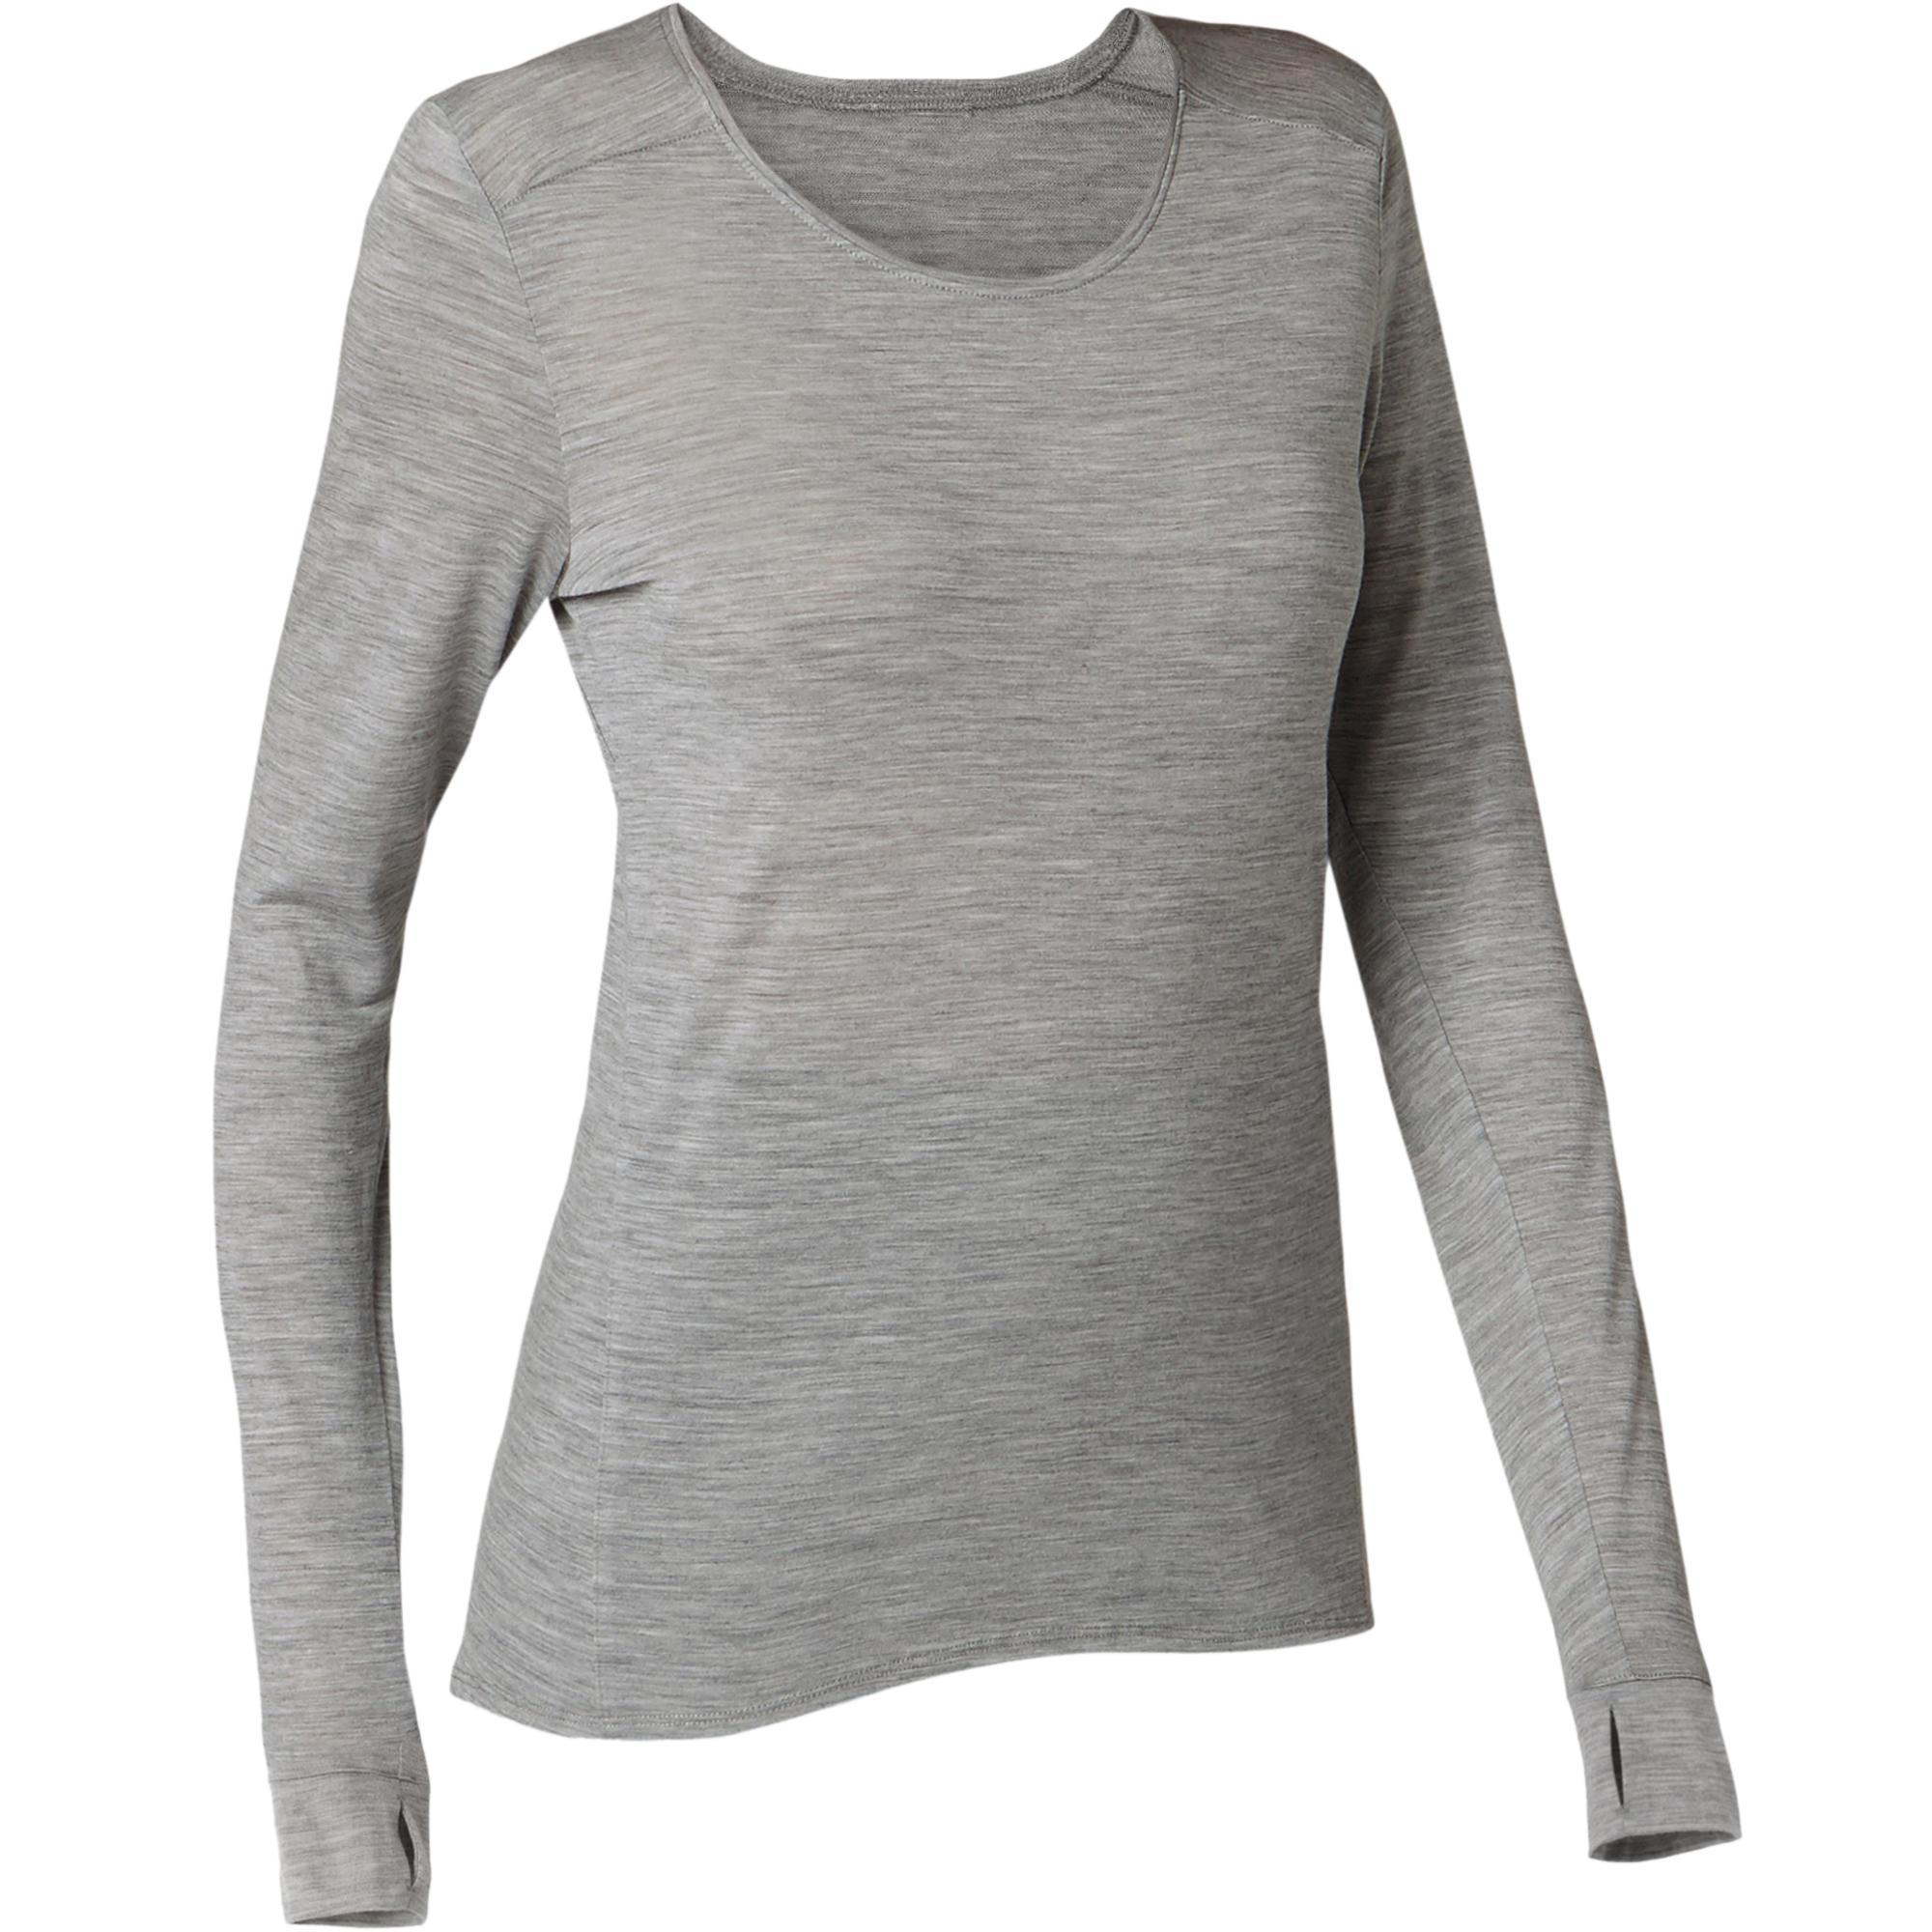 Women's wear - Women's Long-Sleeved Pilates and Gentle Gym Merino Wool  T-Shirt 510 - Grey